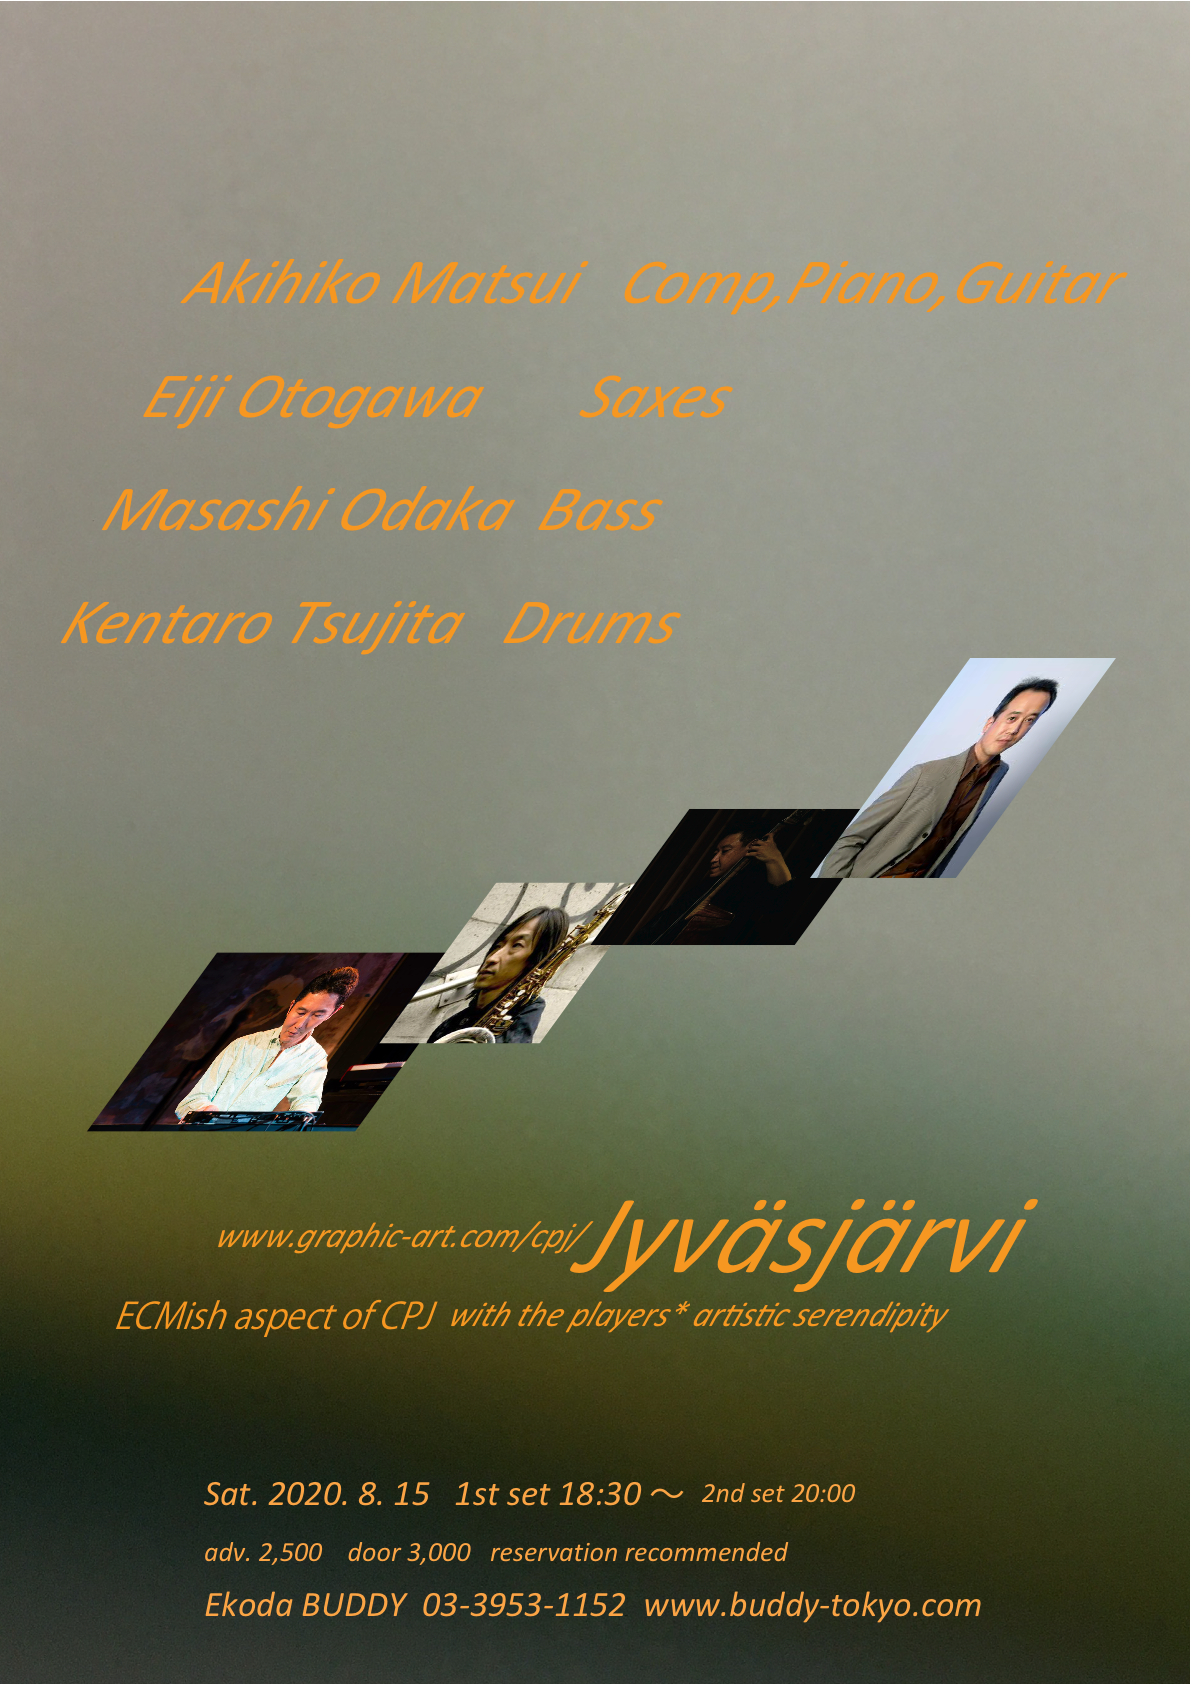 Jyvasjarvi Session2020 コピー